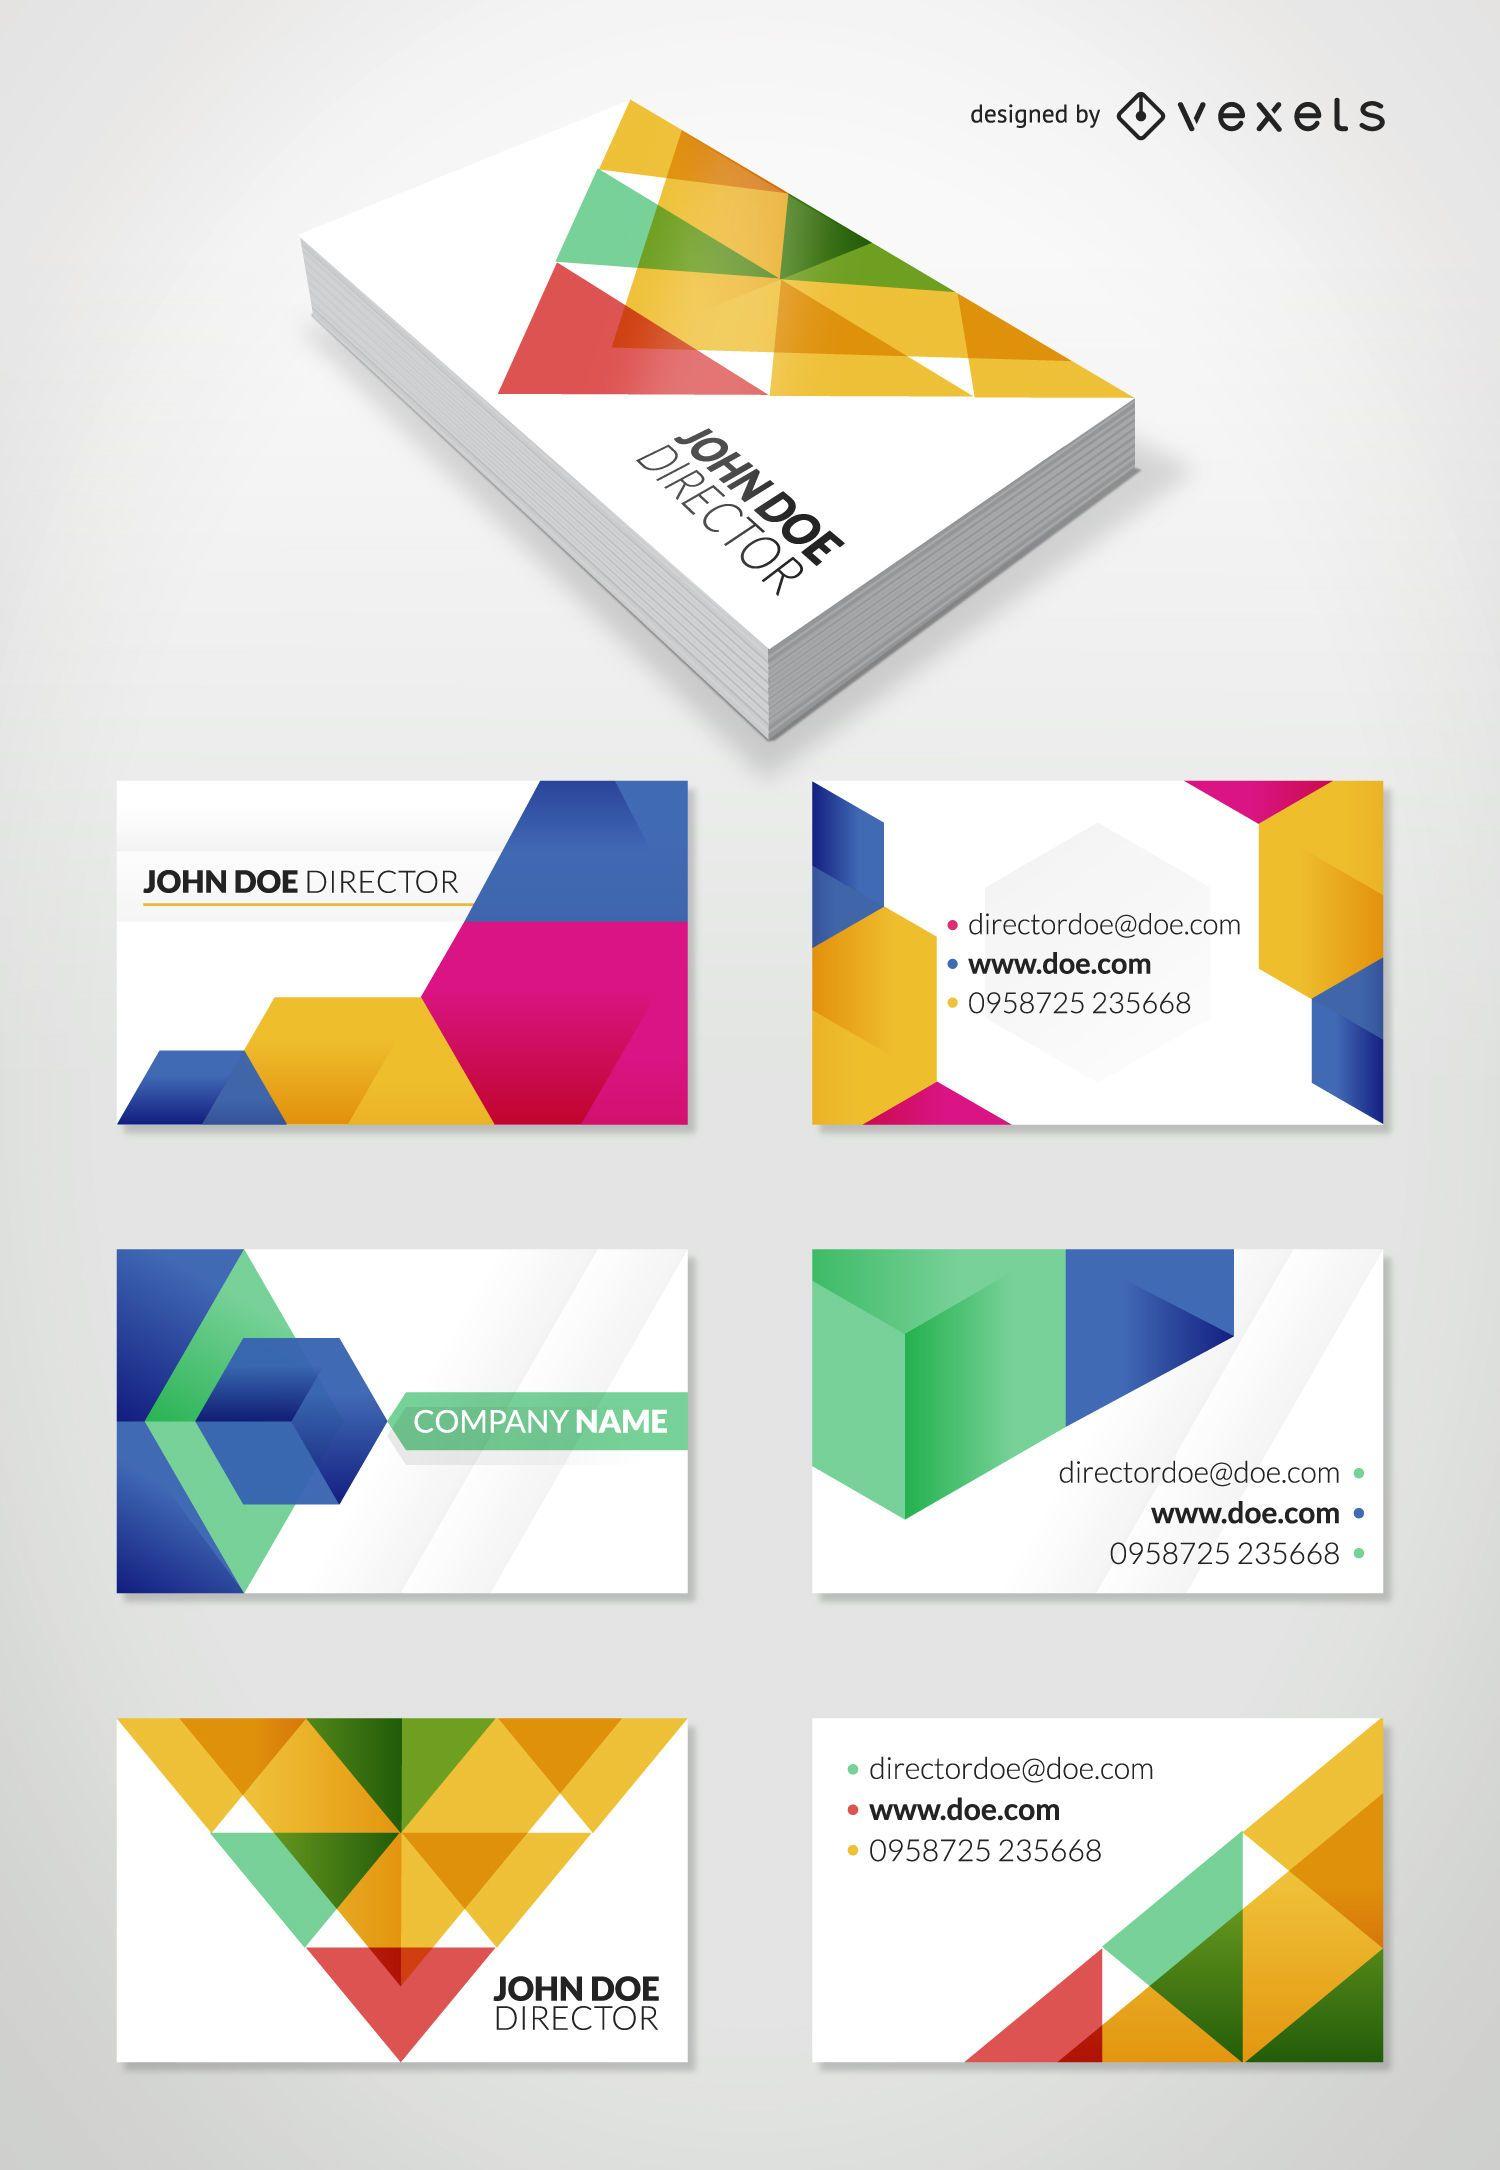 personal business card psd mockup psd